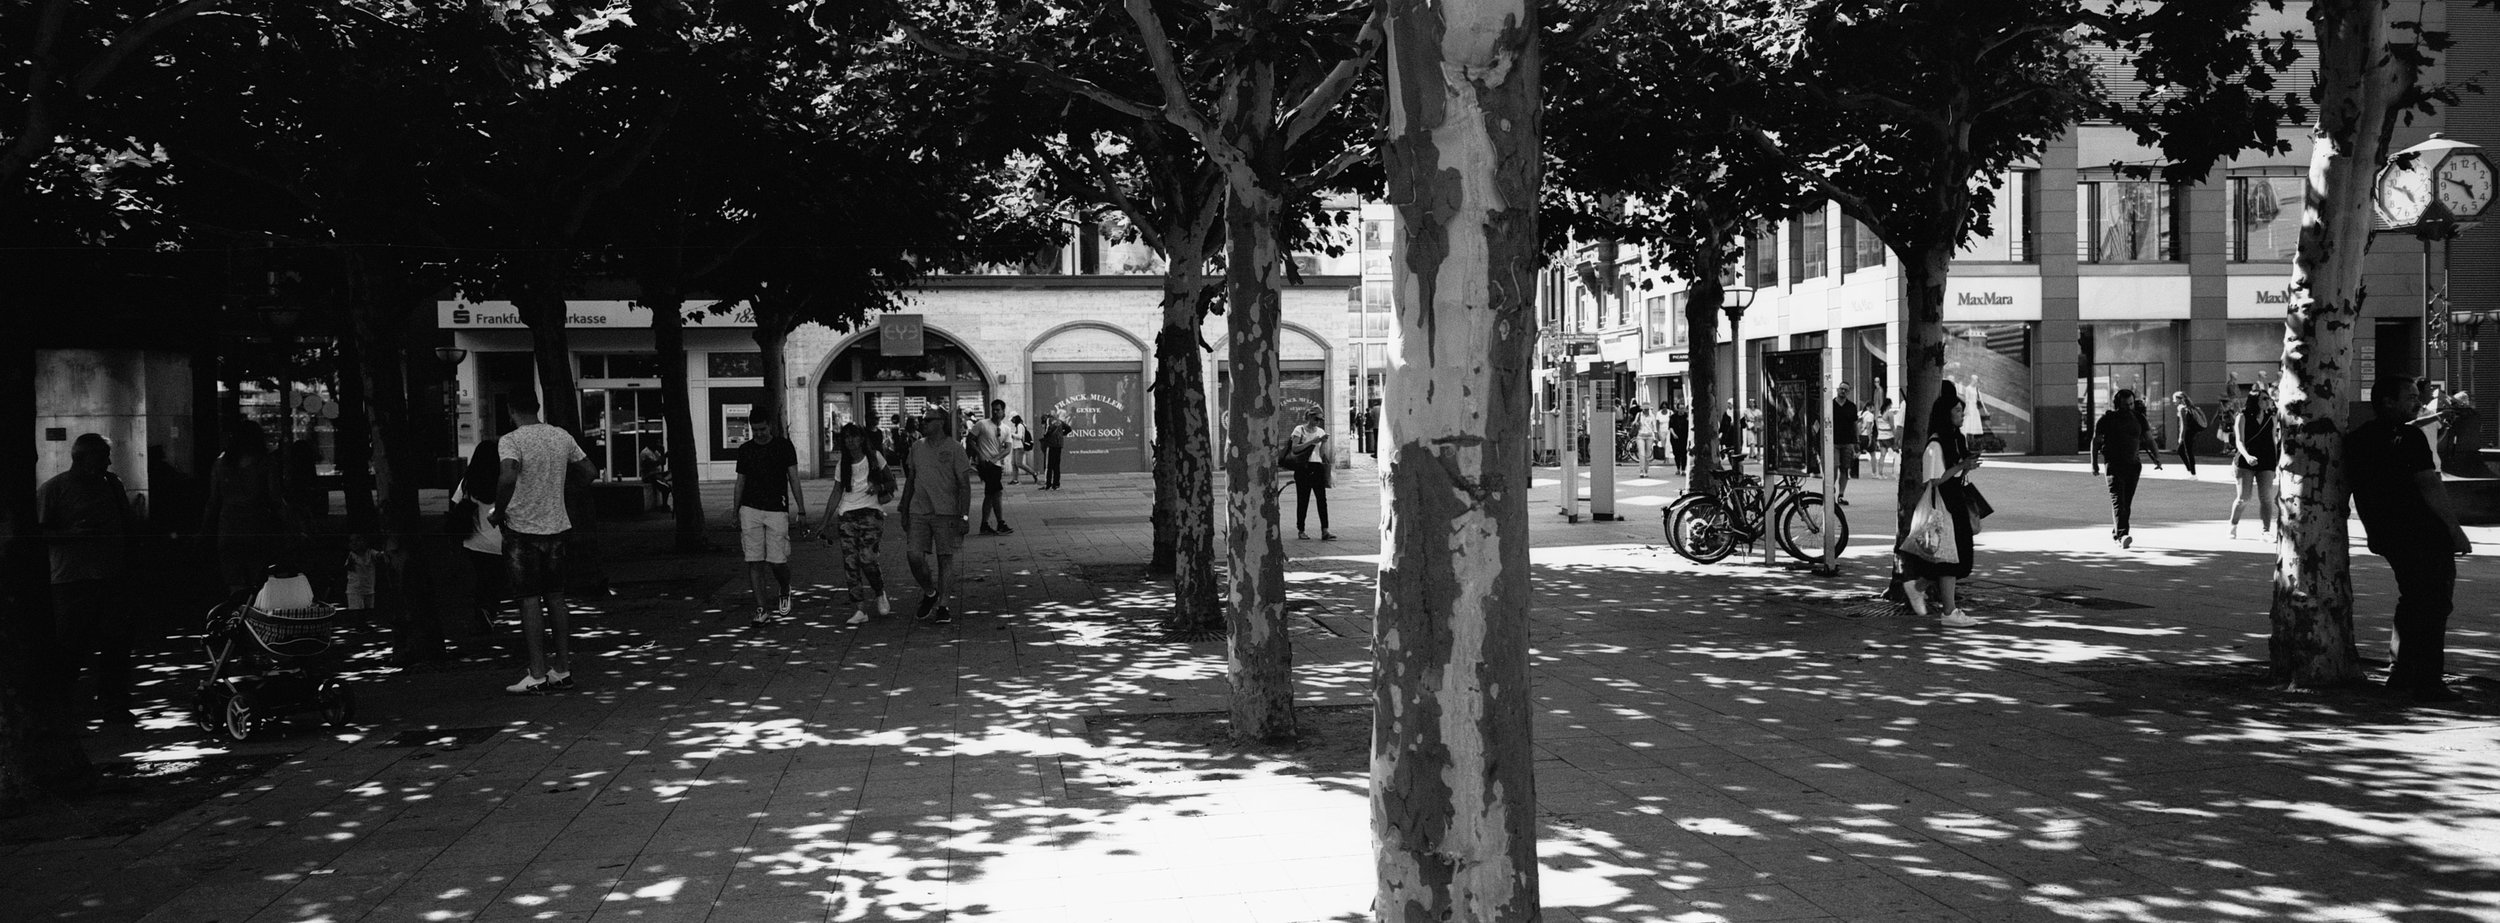 Ferrania11.jpg